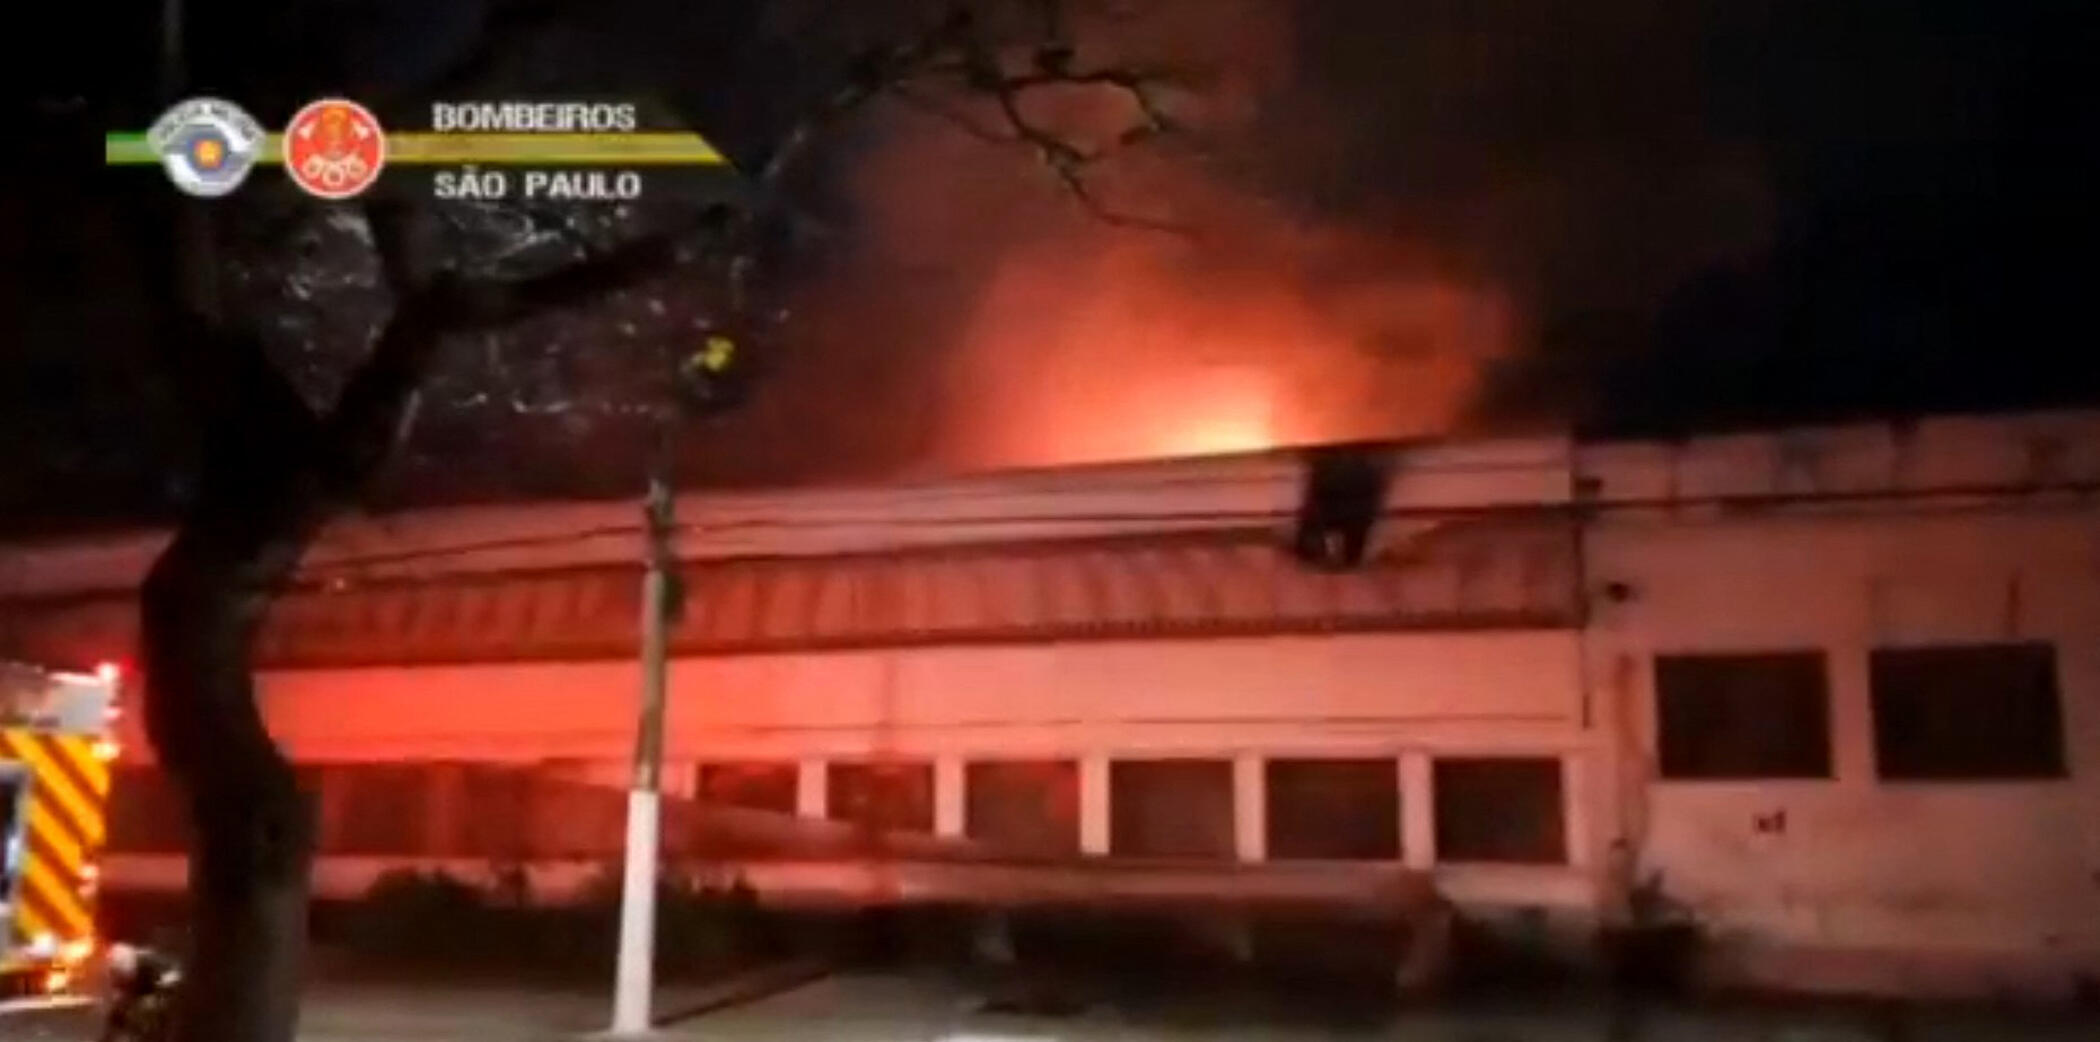 bresil incendie mediatheque